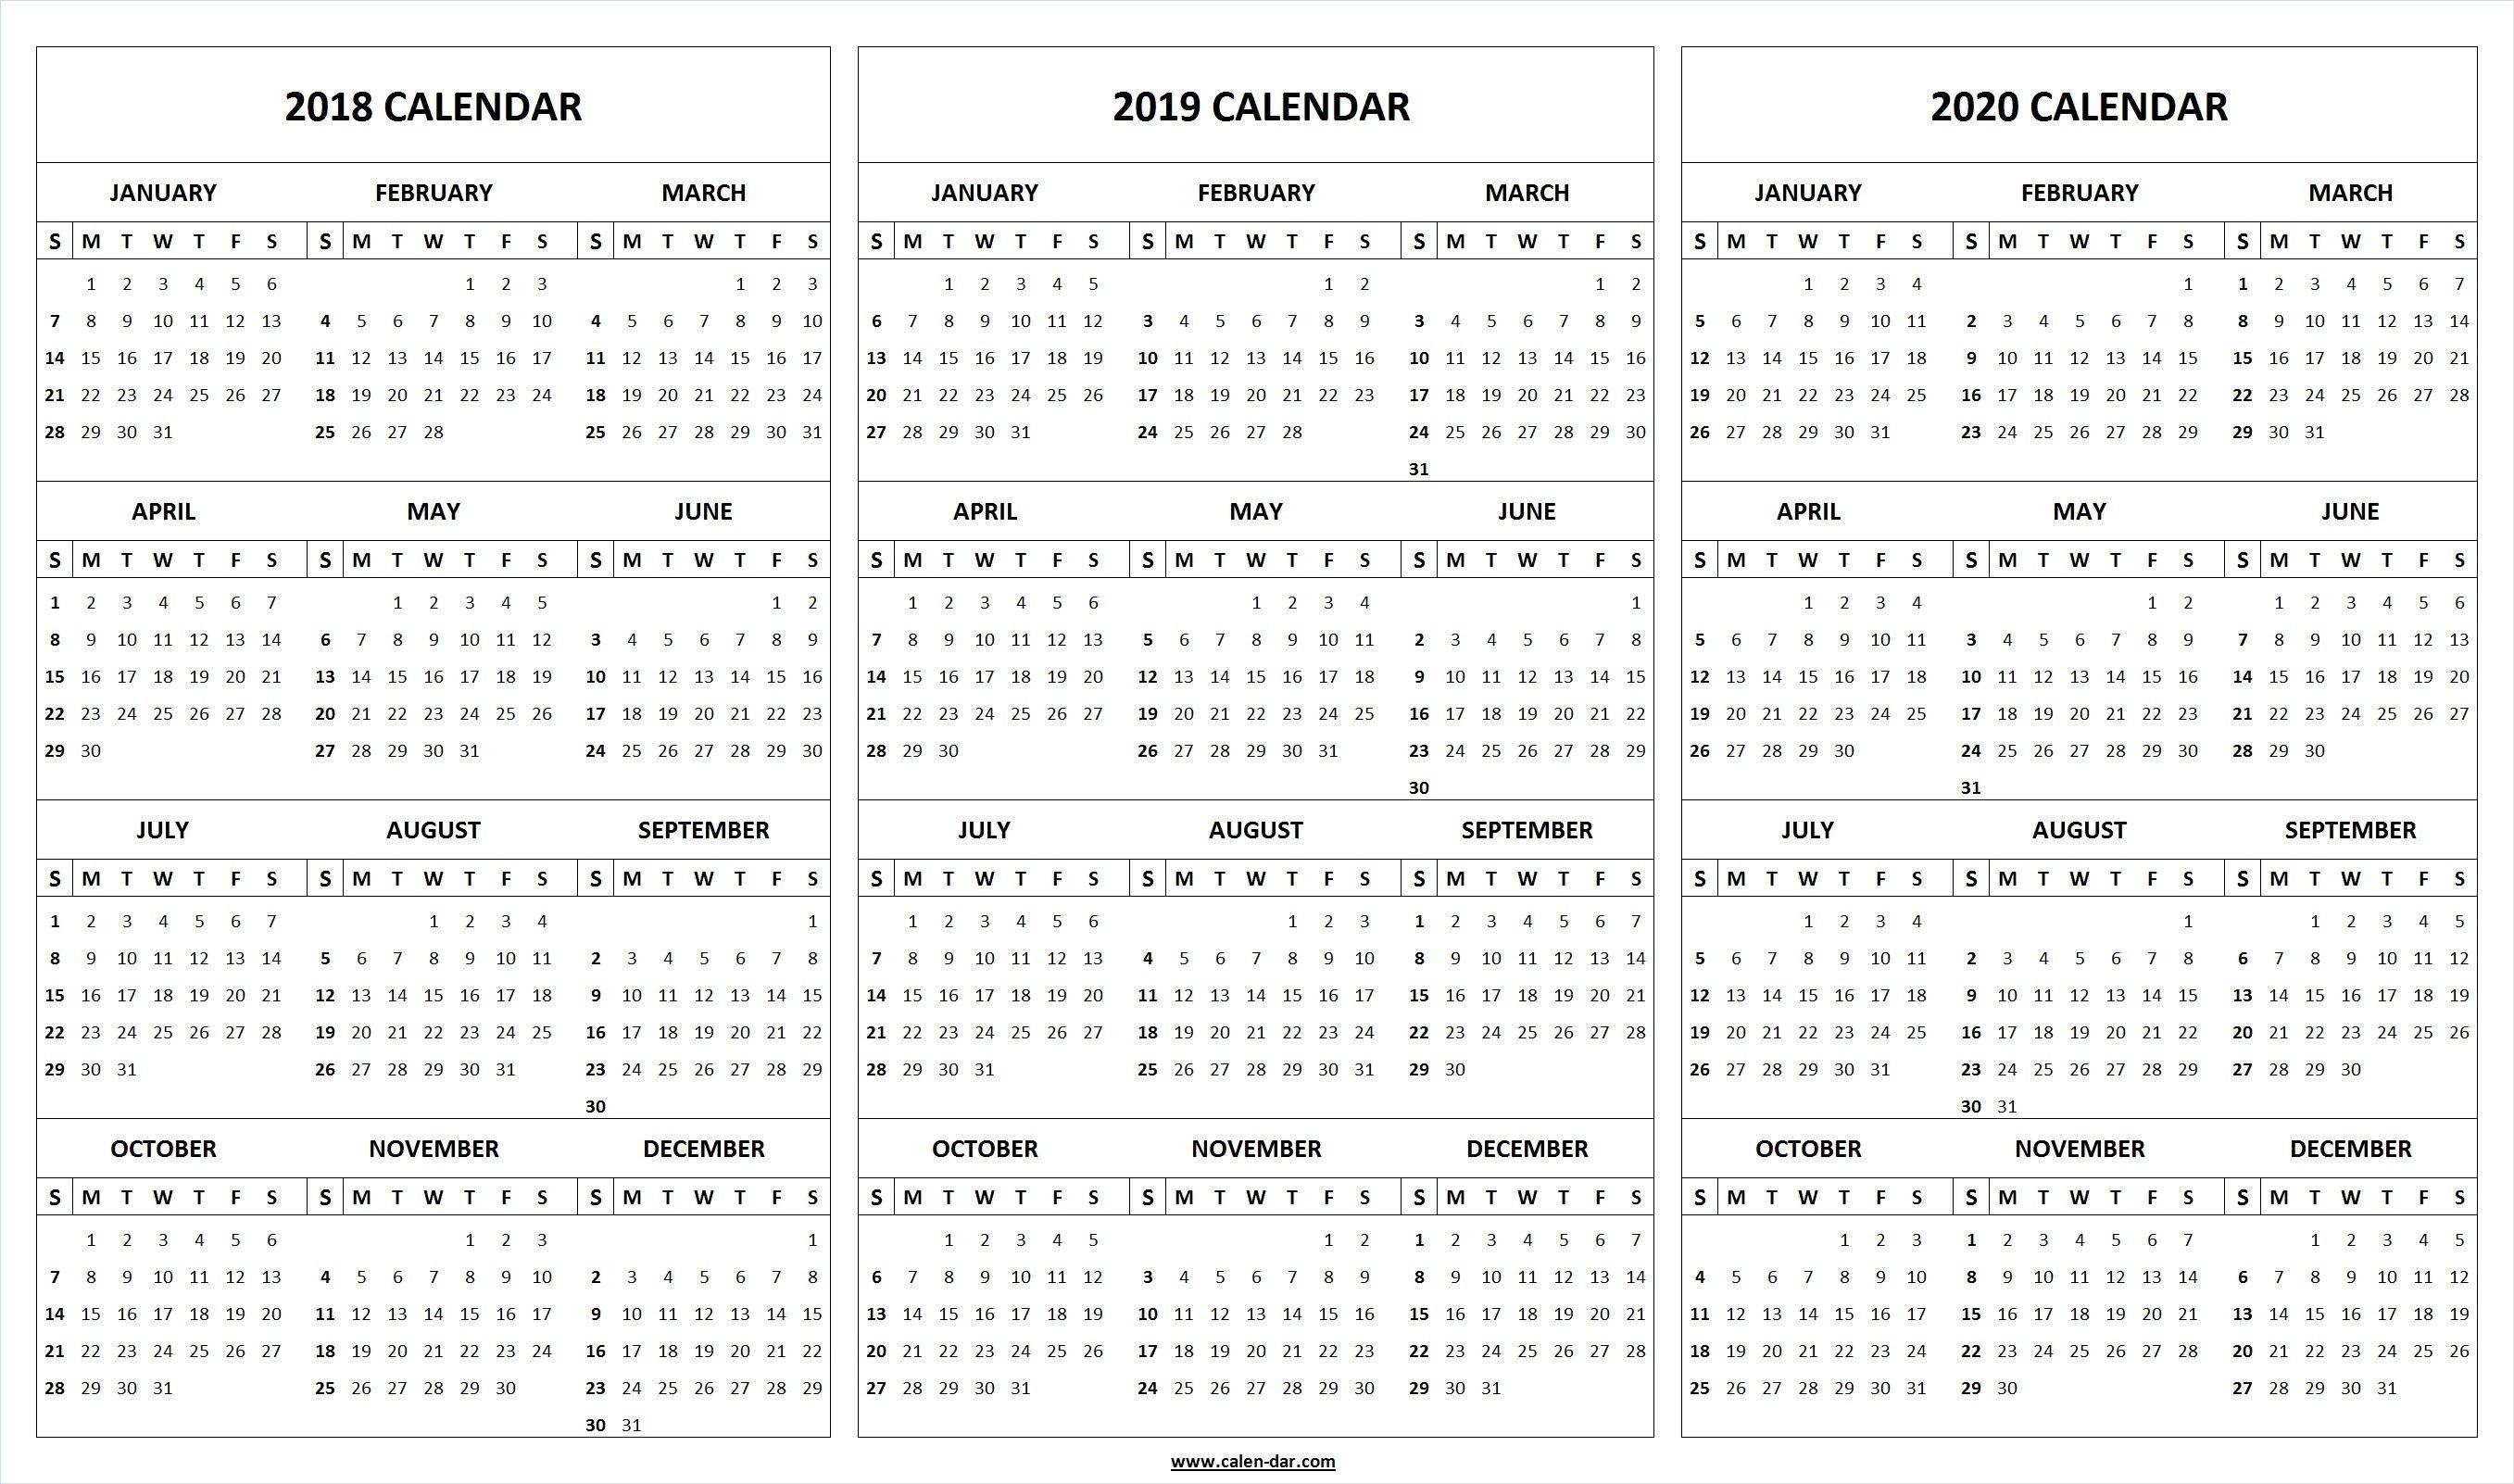 Print Blank 2018 2019 2020 Calendar Template   Organize!   Printable inside Printable Calendar 2020 That You Can Type In